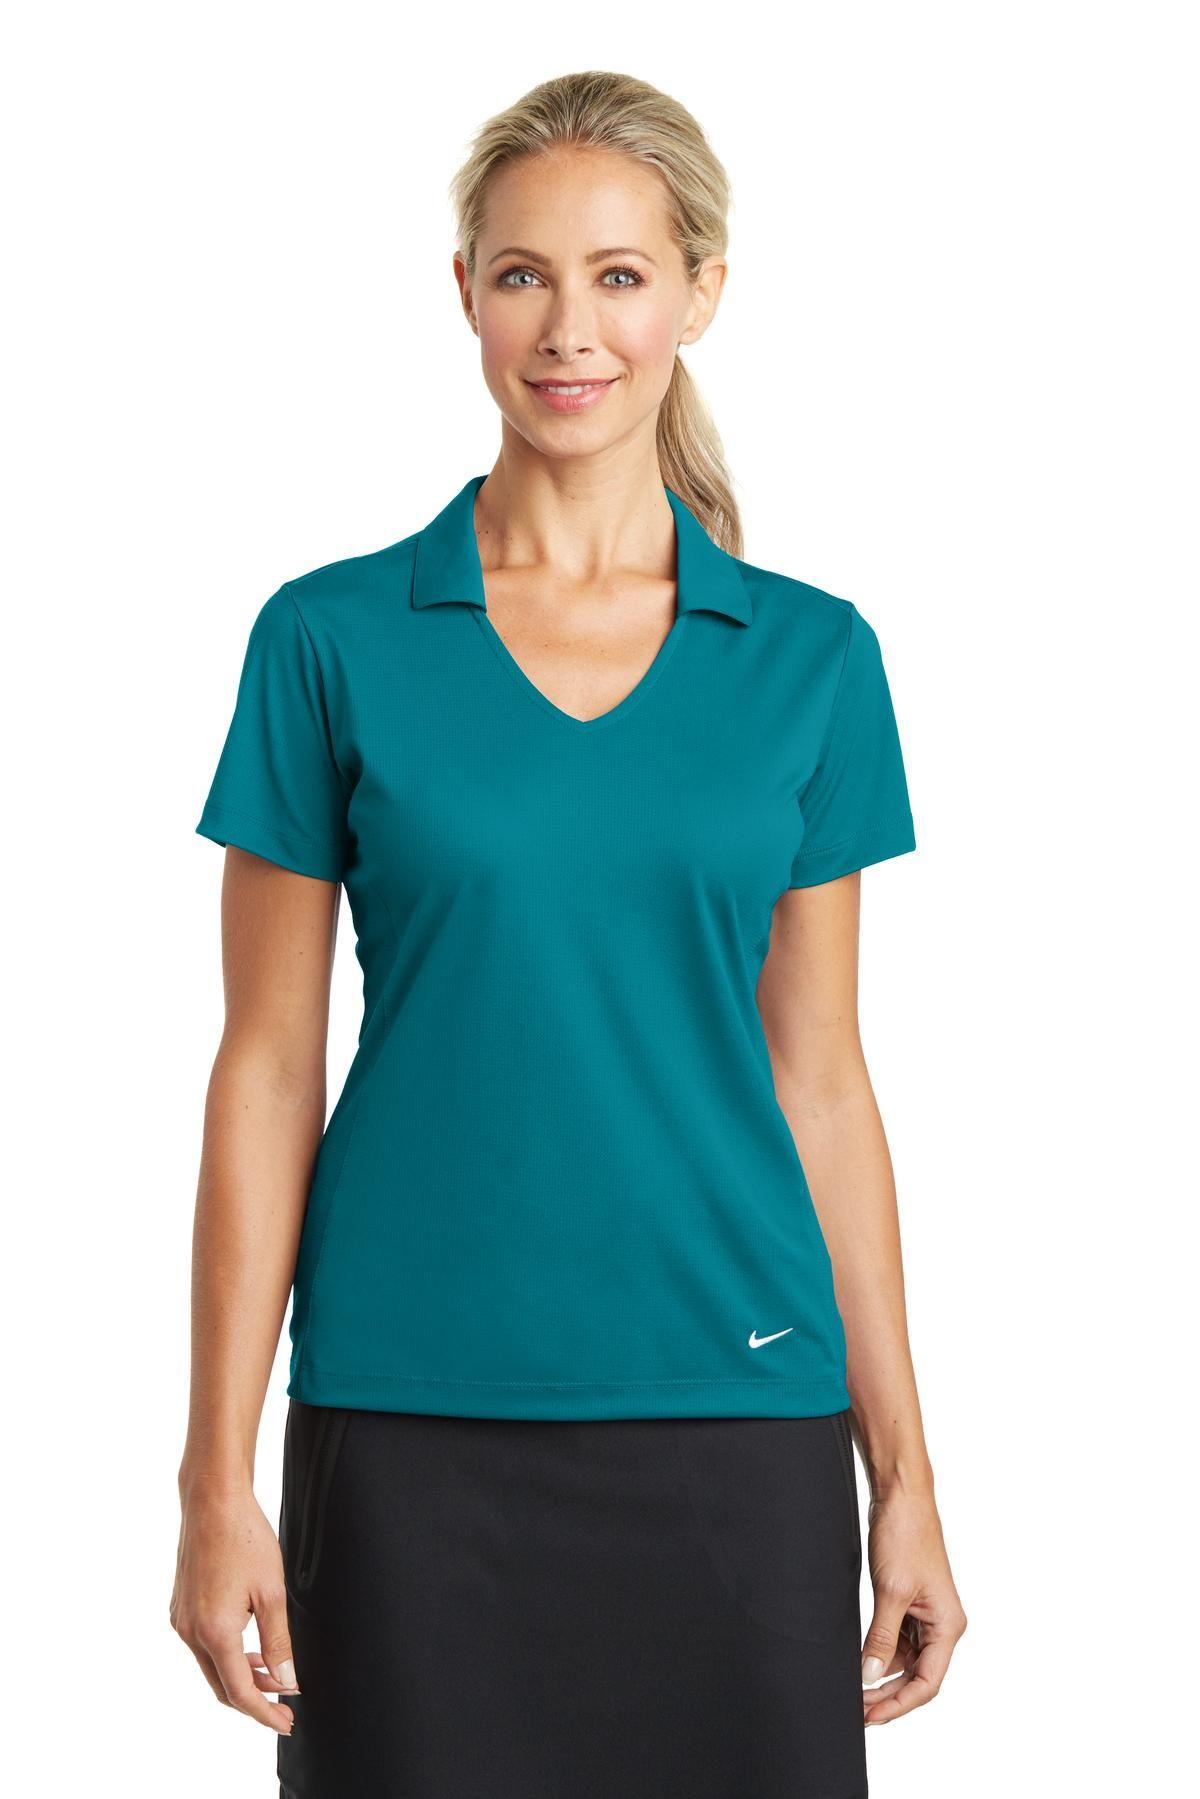 3c9f1d8c5 Nike Golf 637165 - Ladies Dri-FIT Vertical Mesh Polo | sports | Nike ...